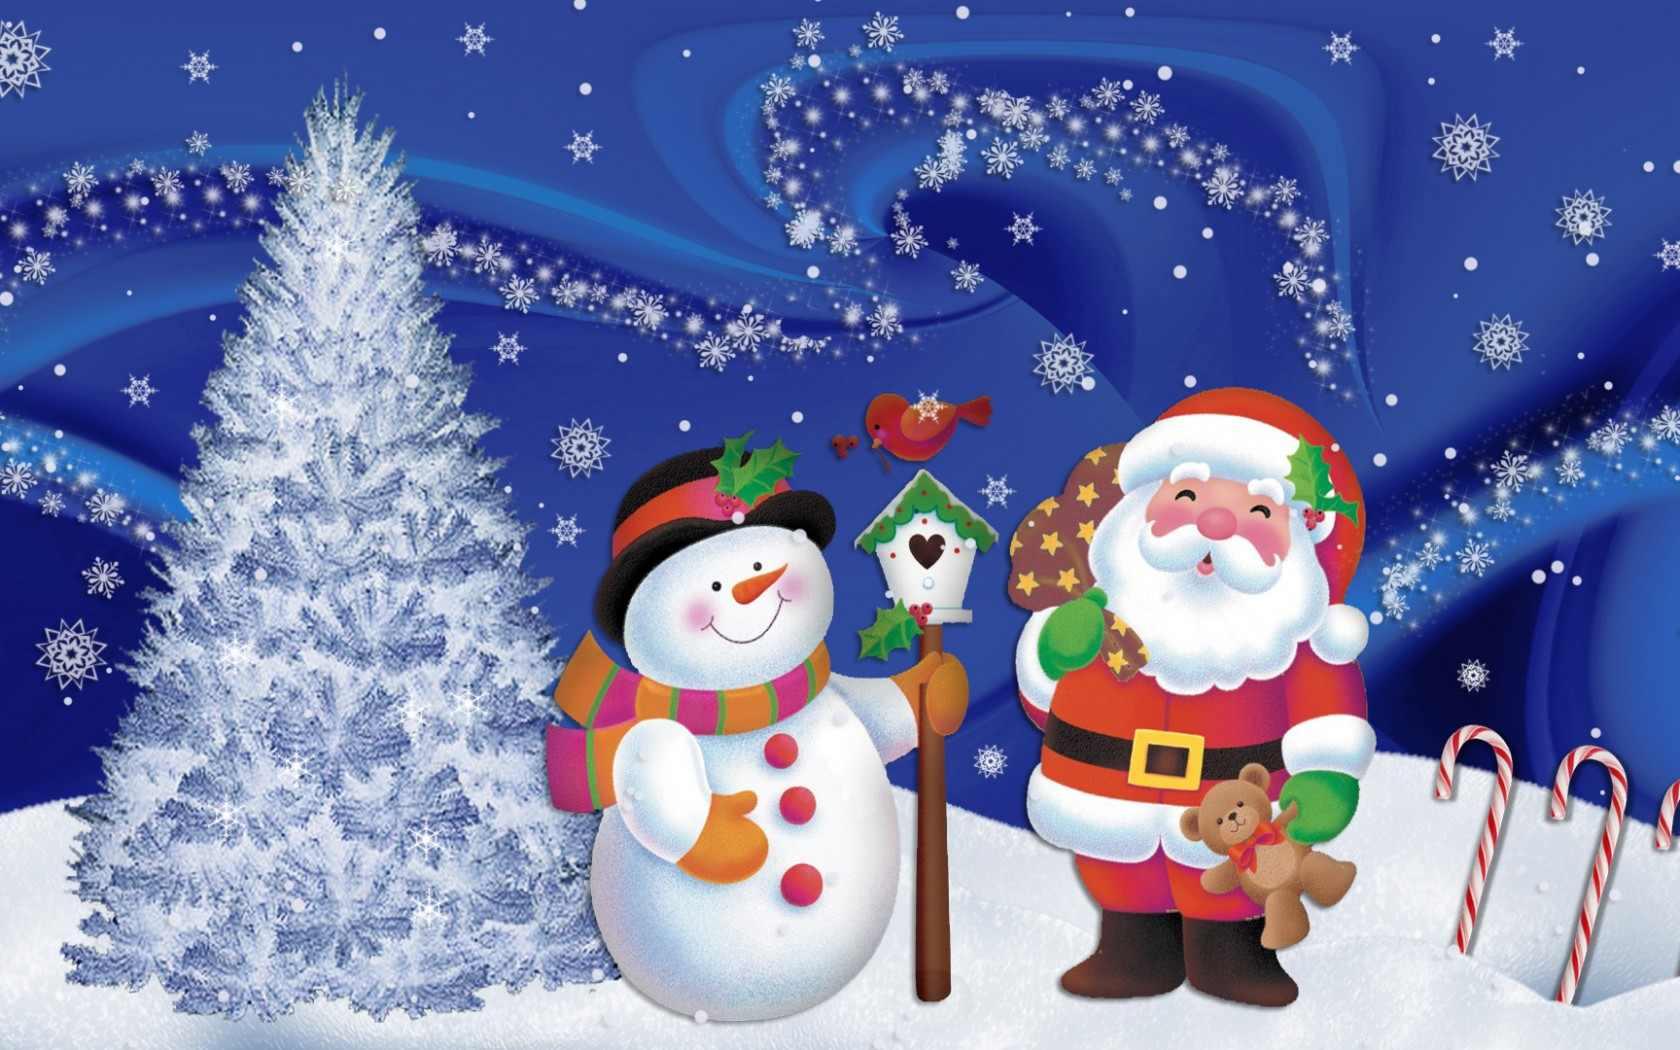 http://activerain.com/image_store/uploads/agents/debbiesellscolorado/files/hd-wallpapers-microsoft-christmas-wallpaper-santa-1680x1050-wallpaper.jpg